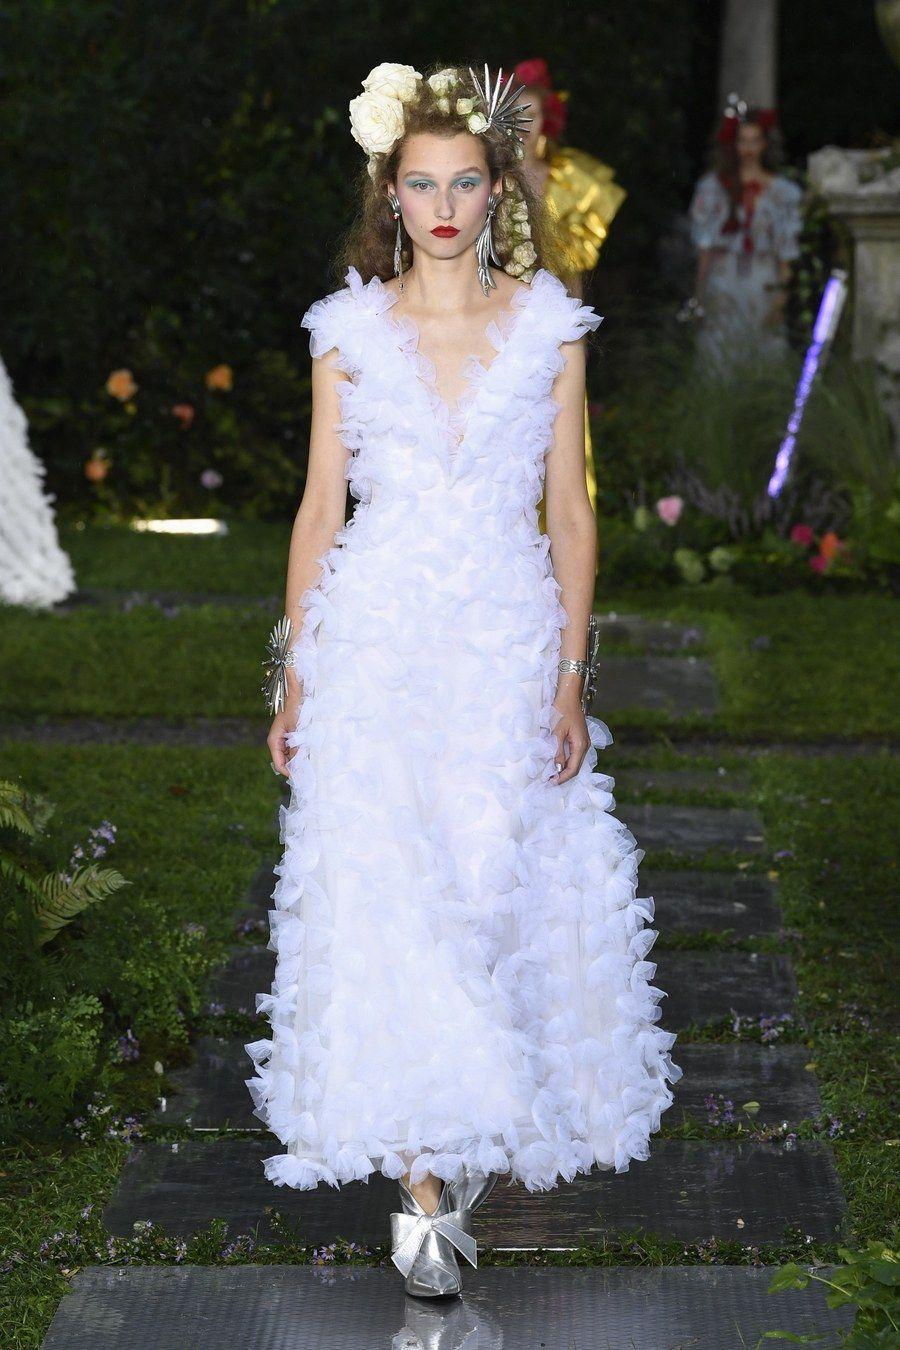 Wedding Classy dresses pictures